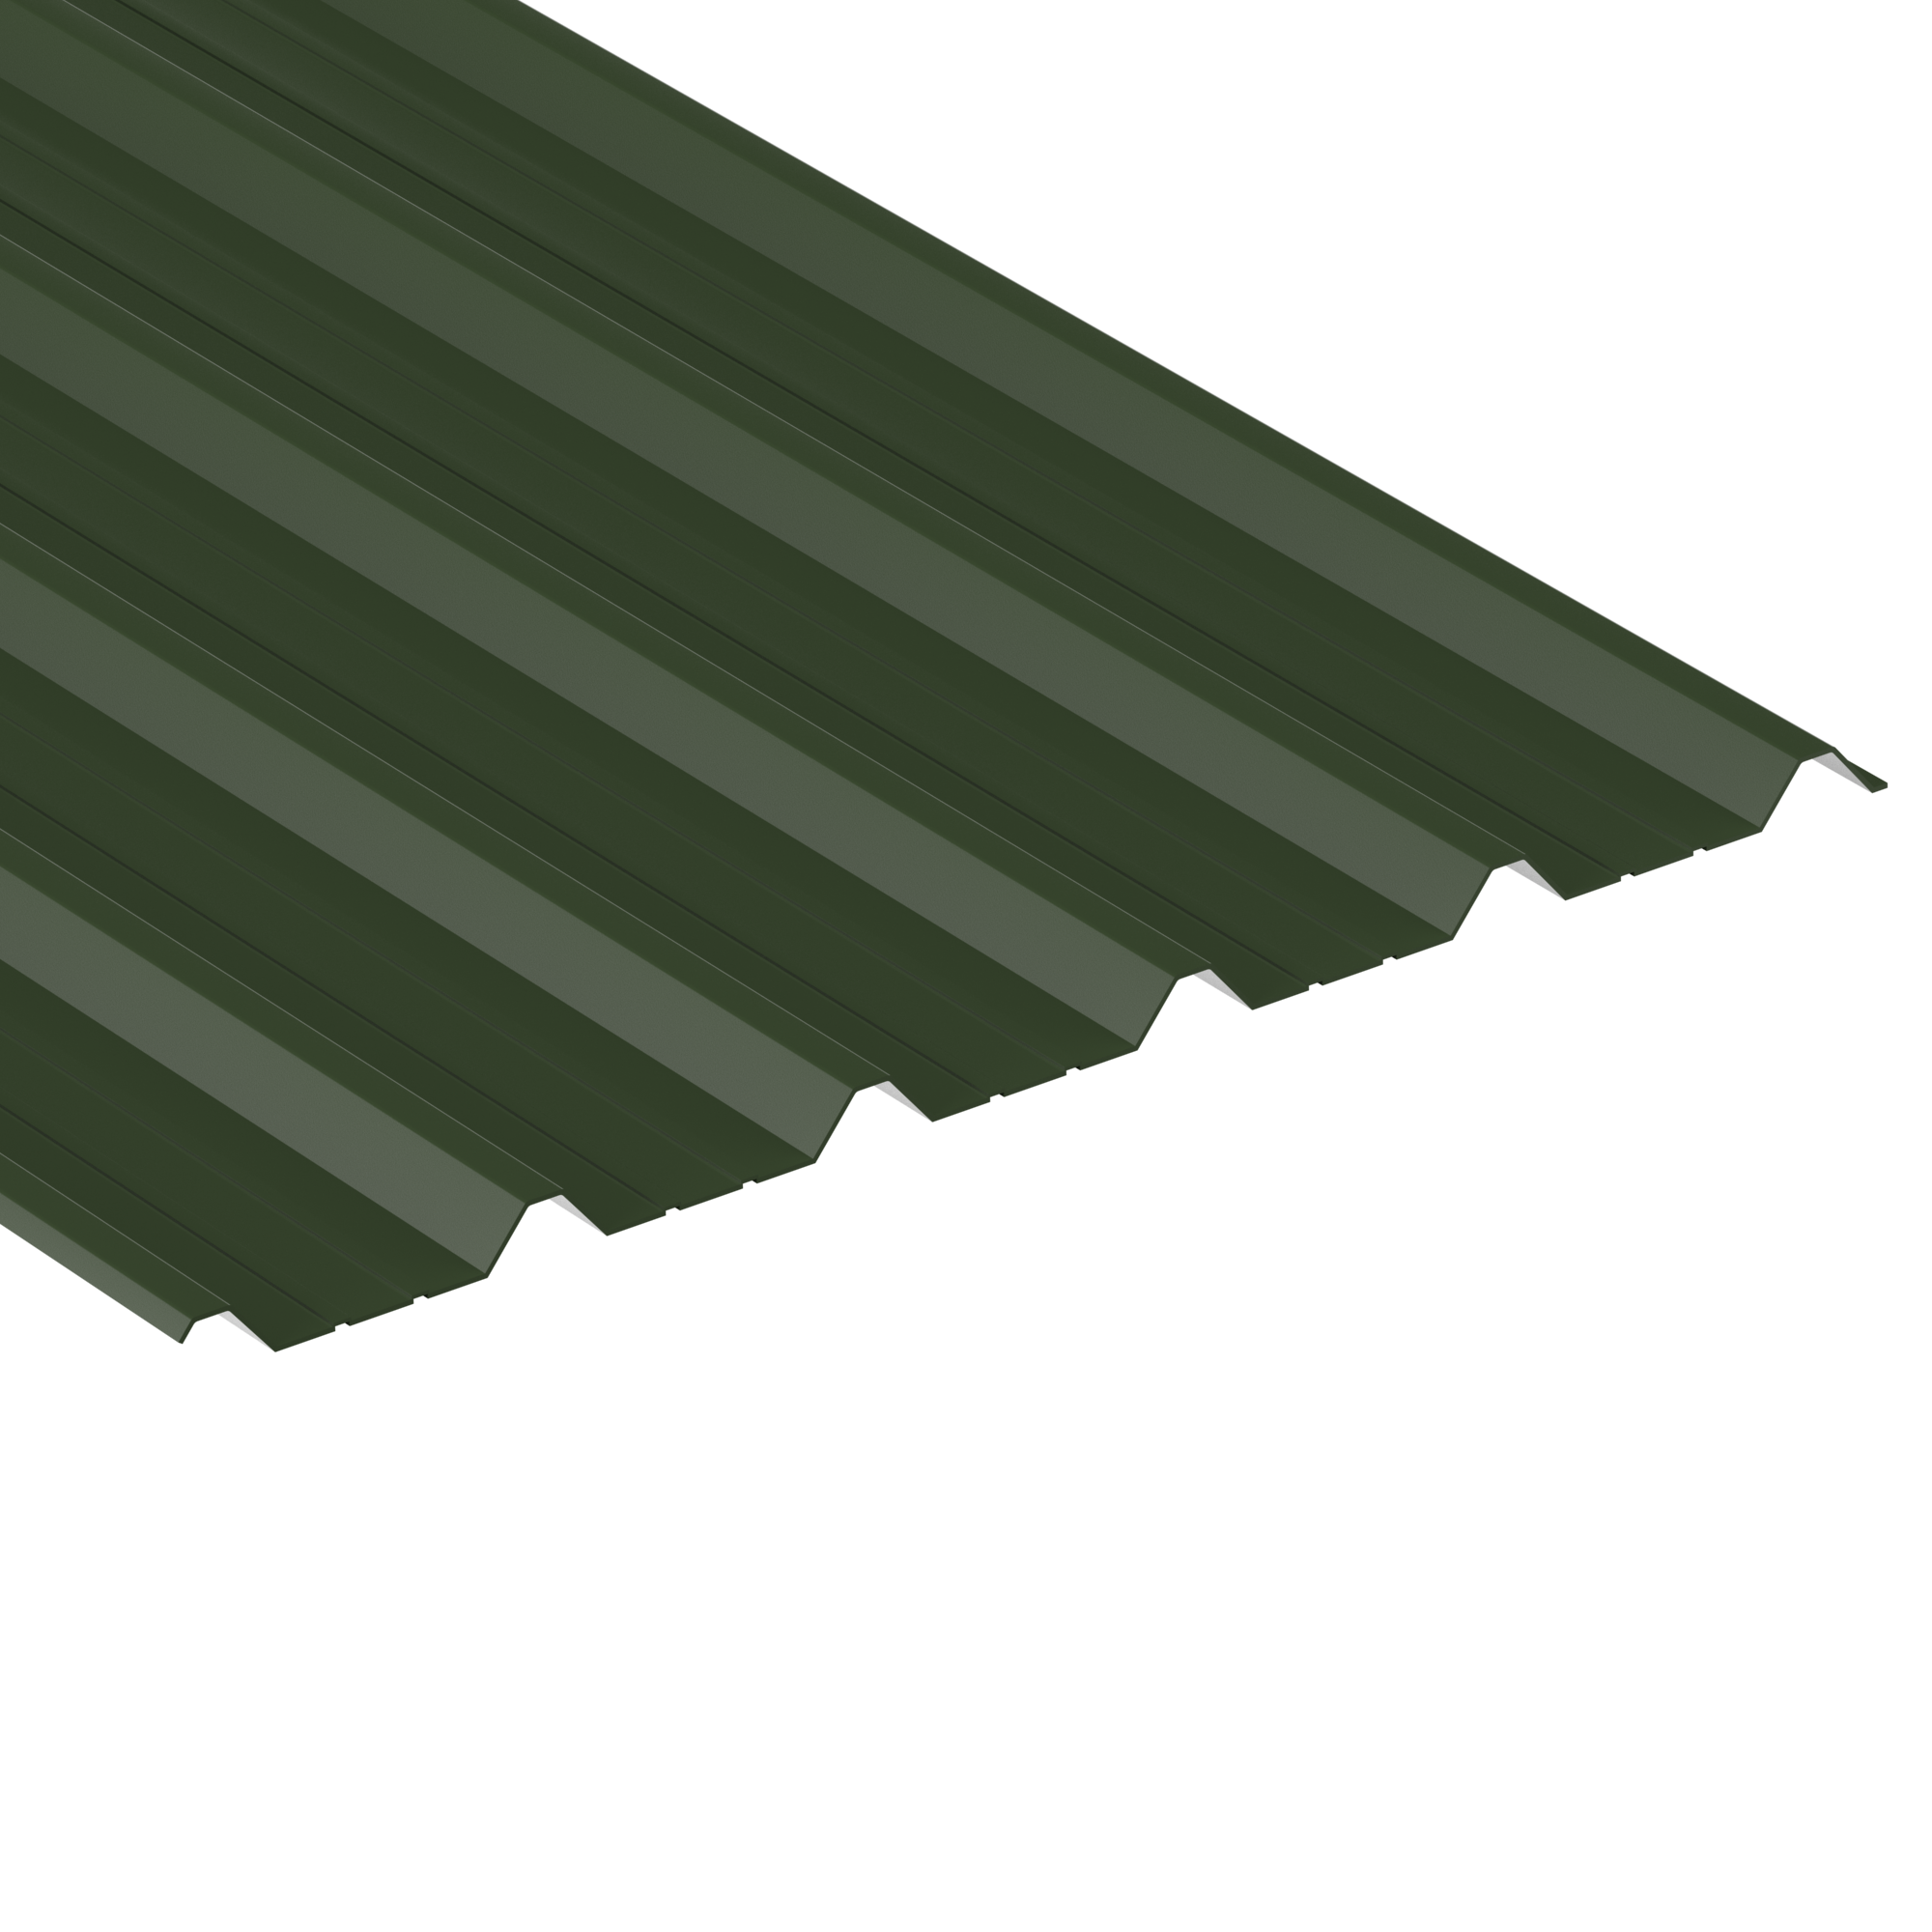 Juniper Green painted finish box profile